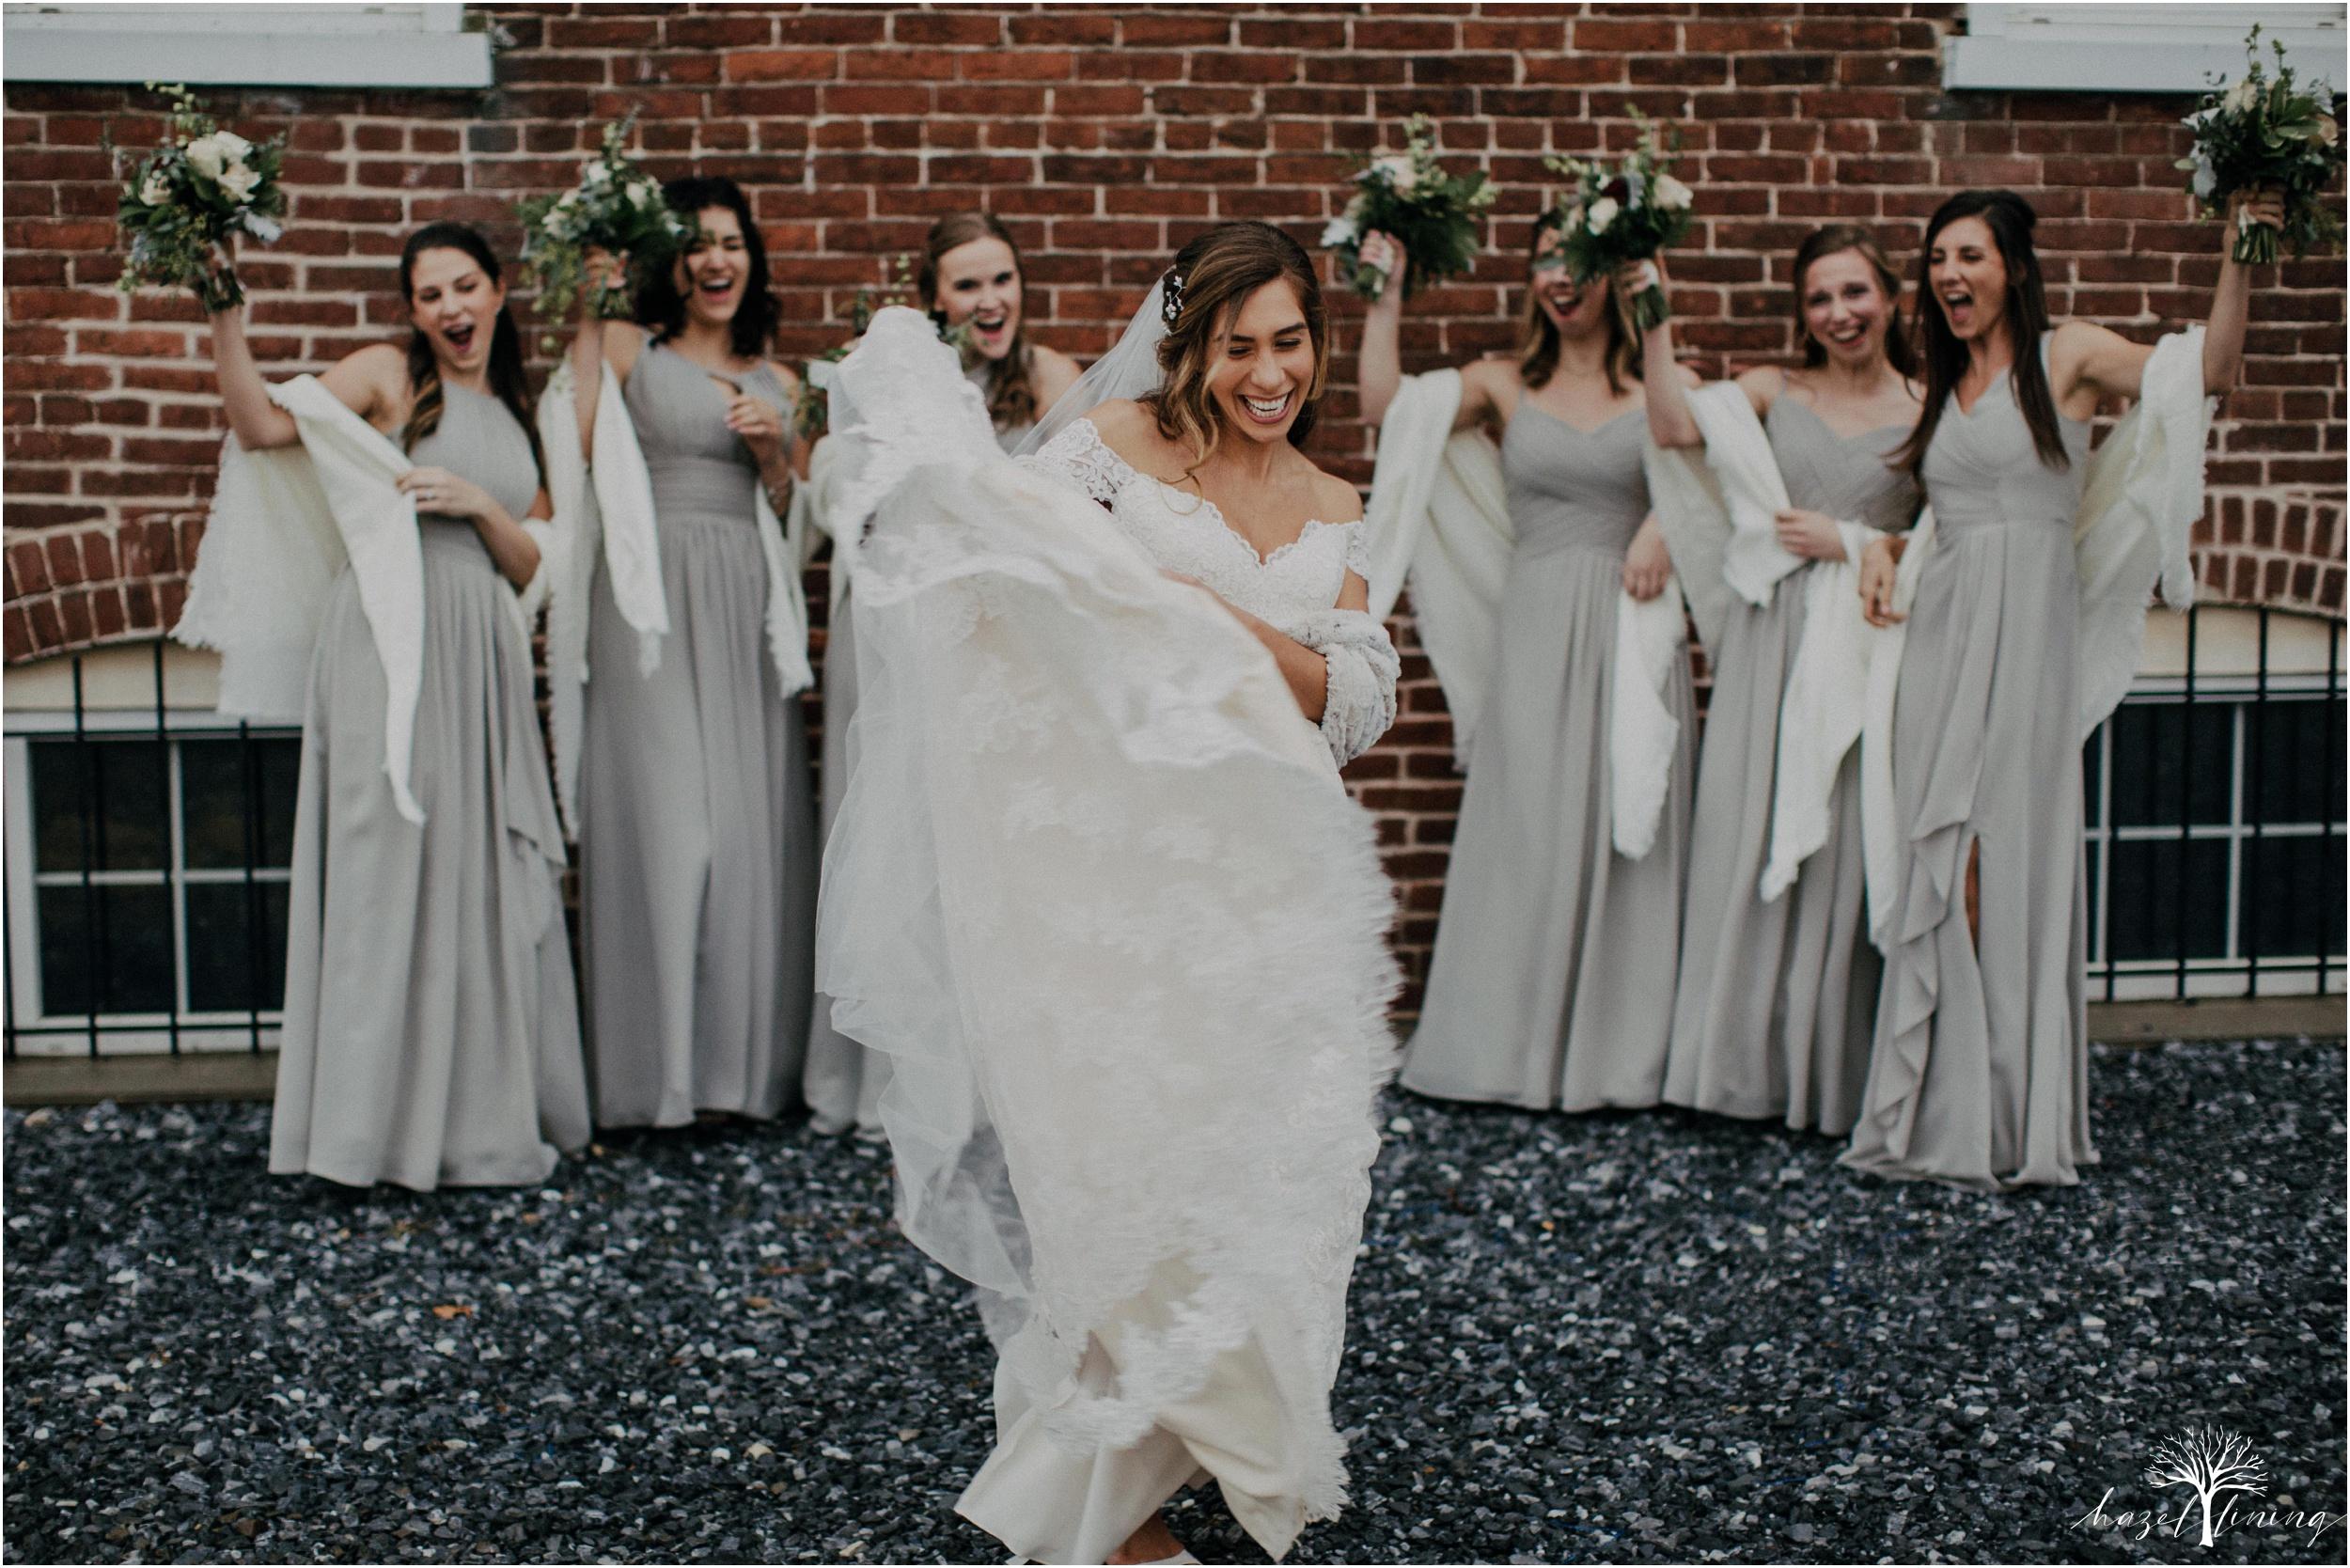 emma-matt-gehringer-the-booking-house-lancaster-manhiem-pennsylvania-winter-wedding_0080.jpg